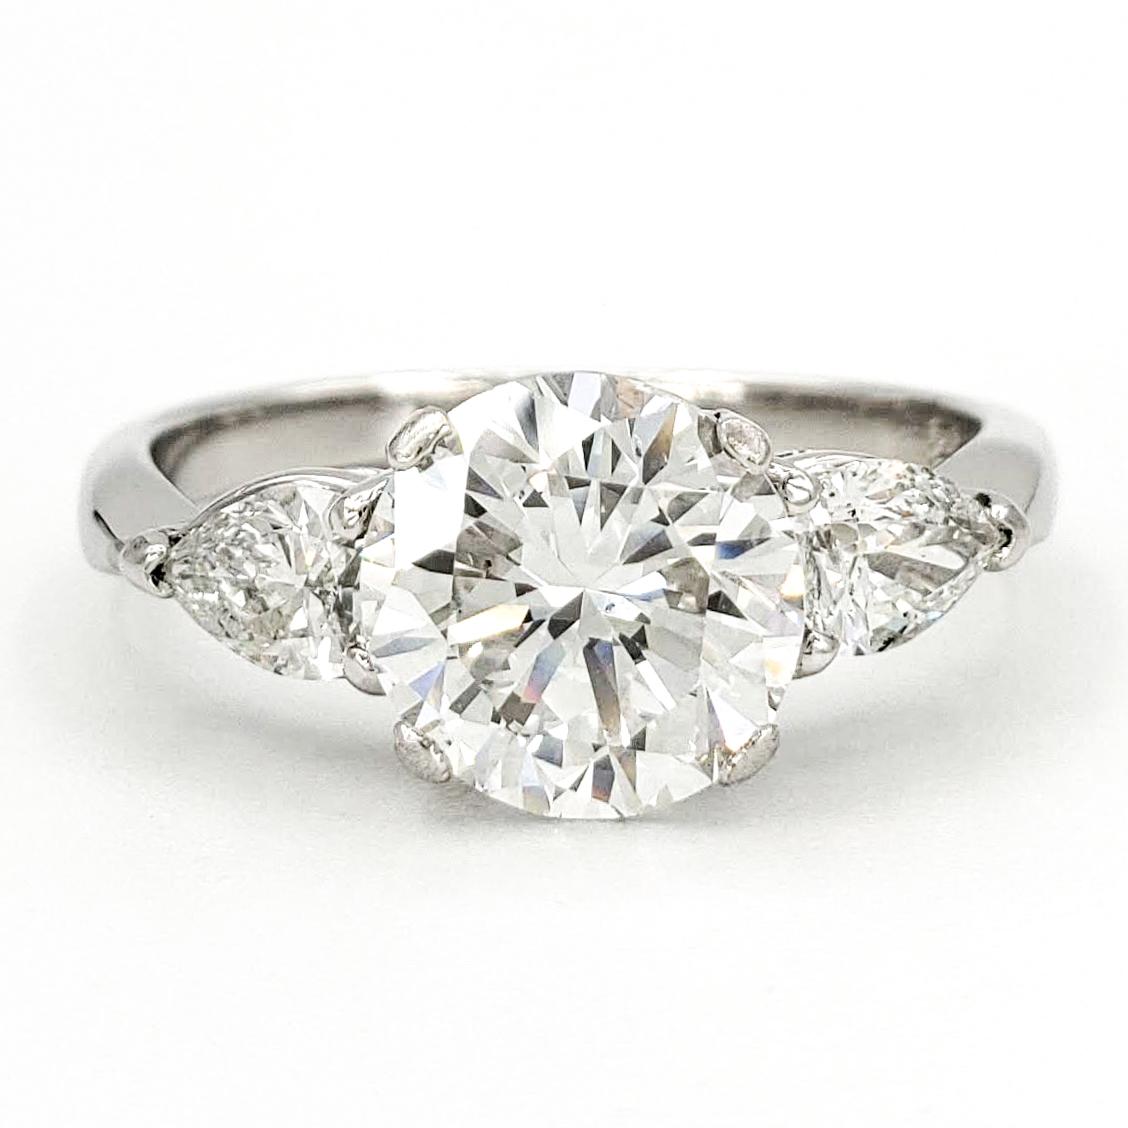 vintage-platinum-engagement-ring-with-2-01-carat-round-brilliant-cut-diamond-gia-e-si1